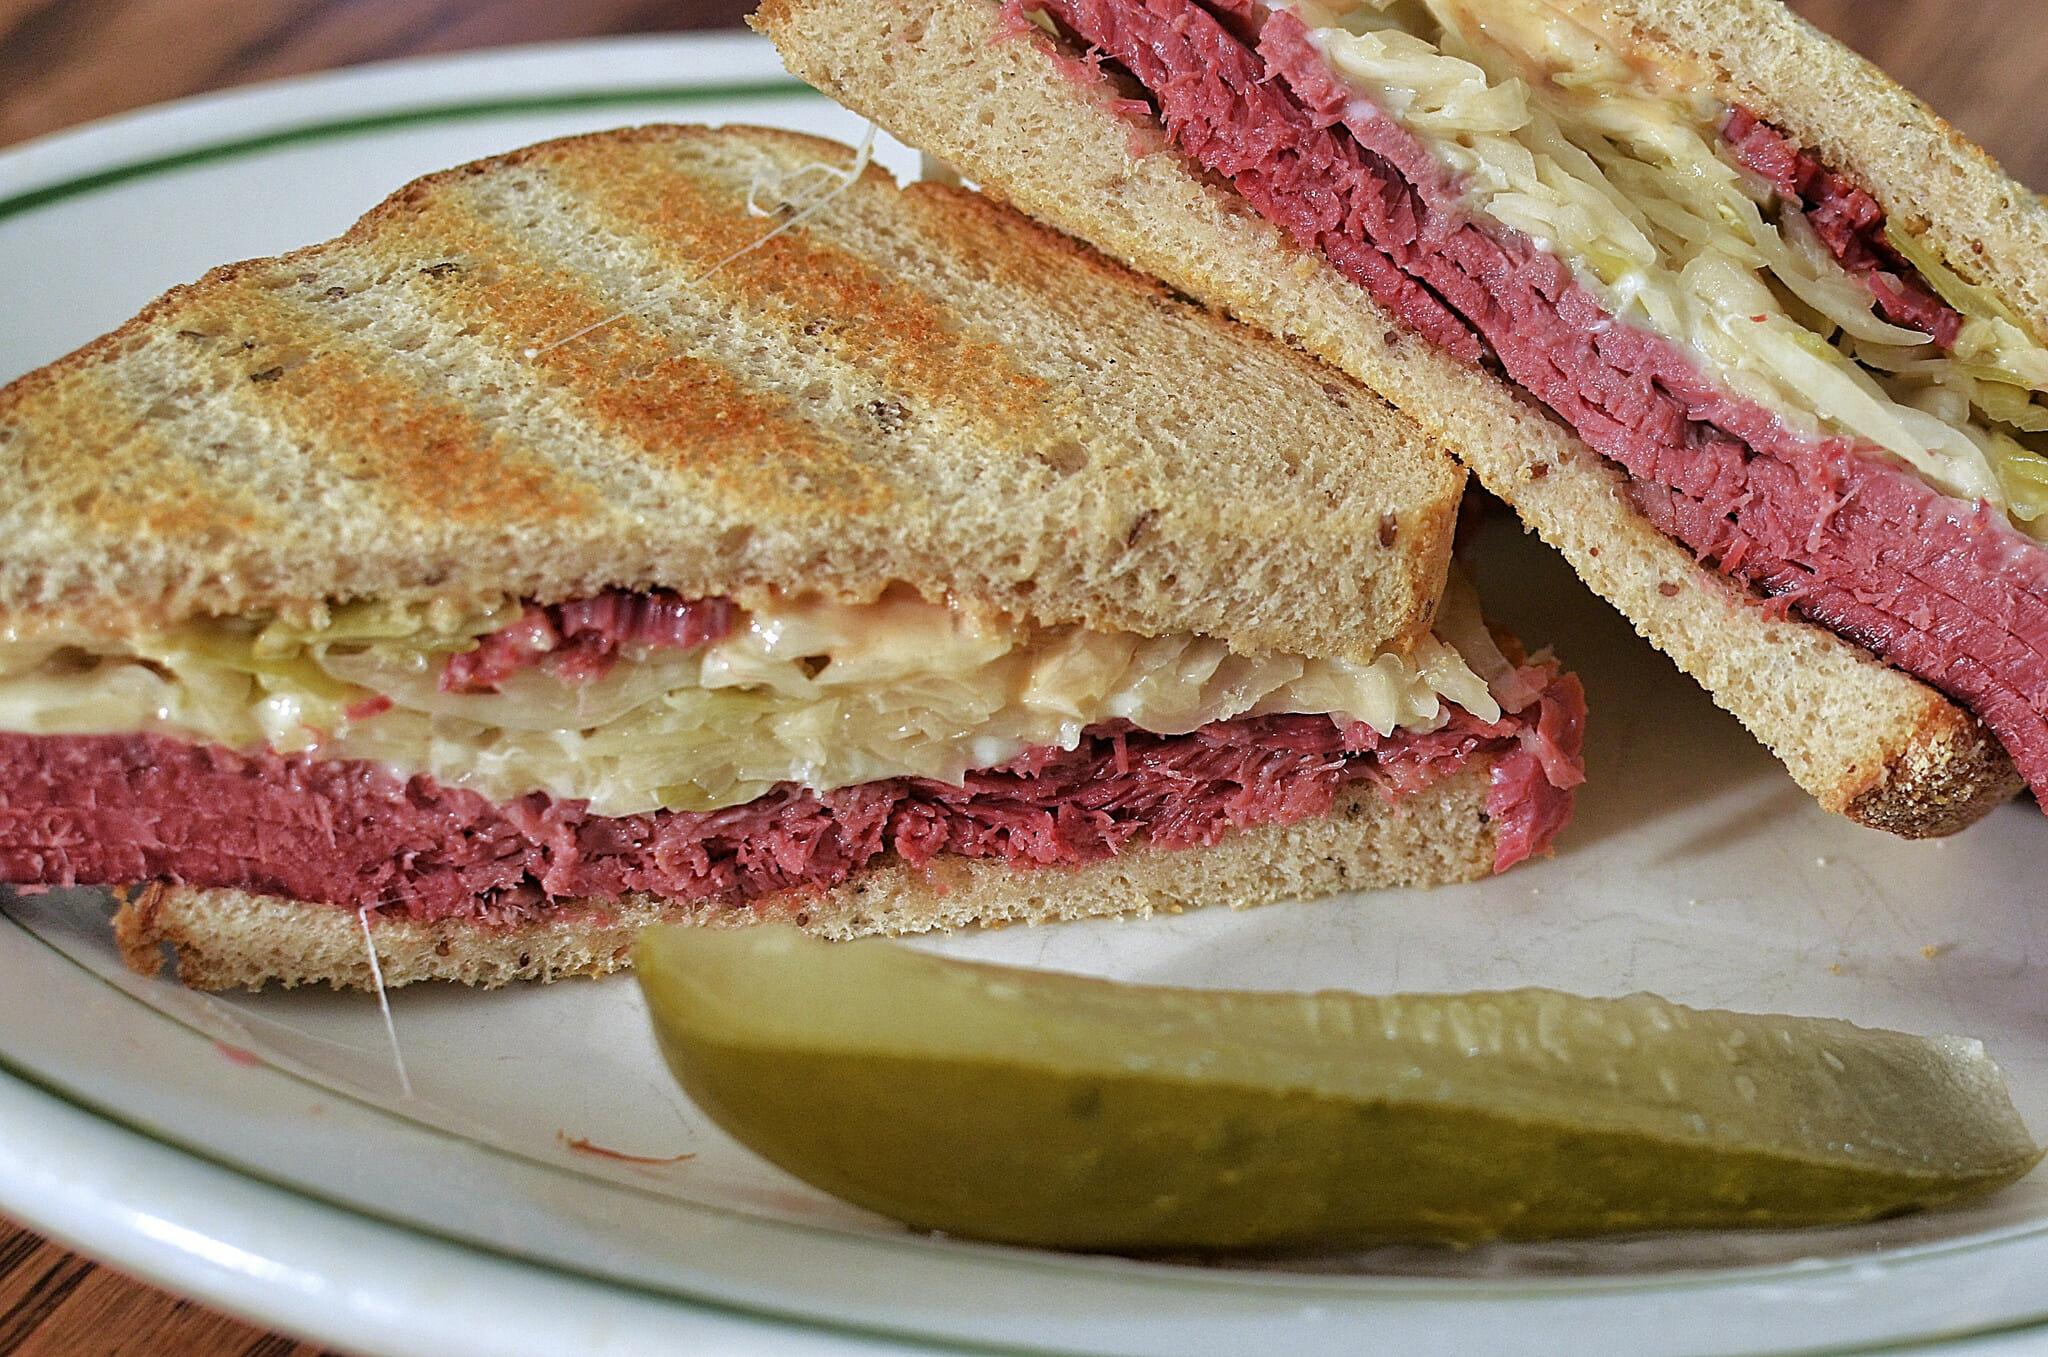 Friedman's: 5 Awesome Lunch Spots Near Penn Station